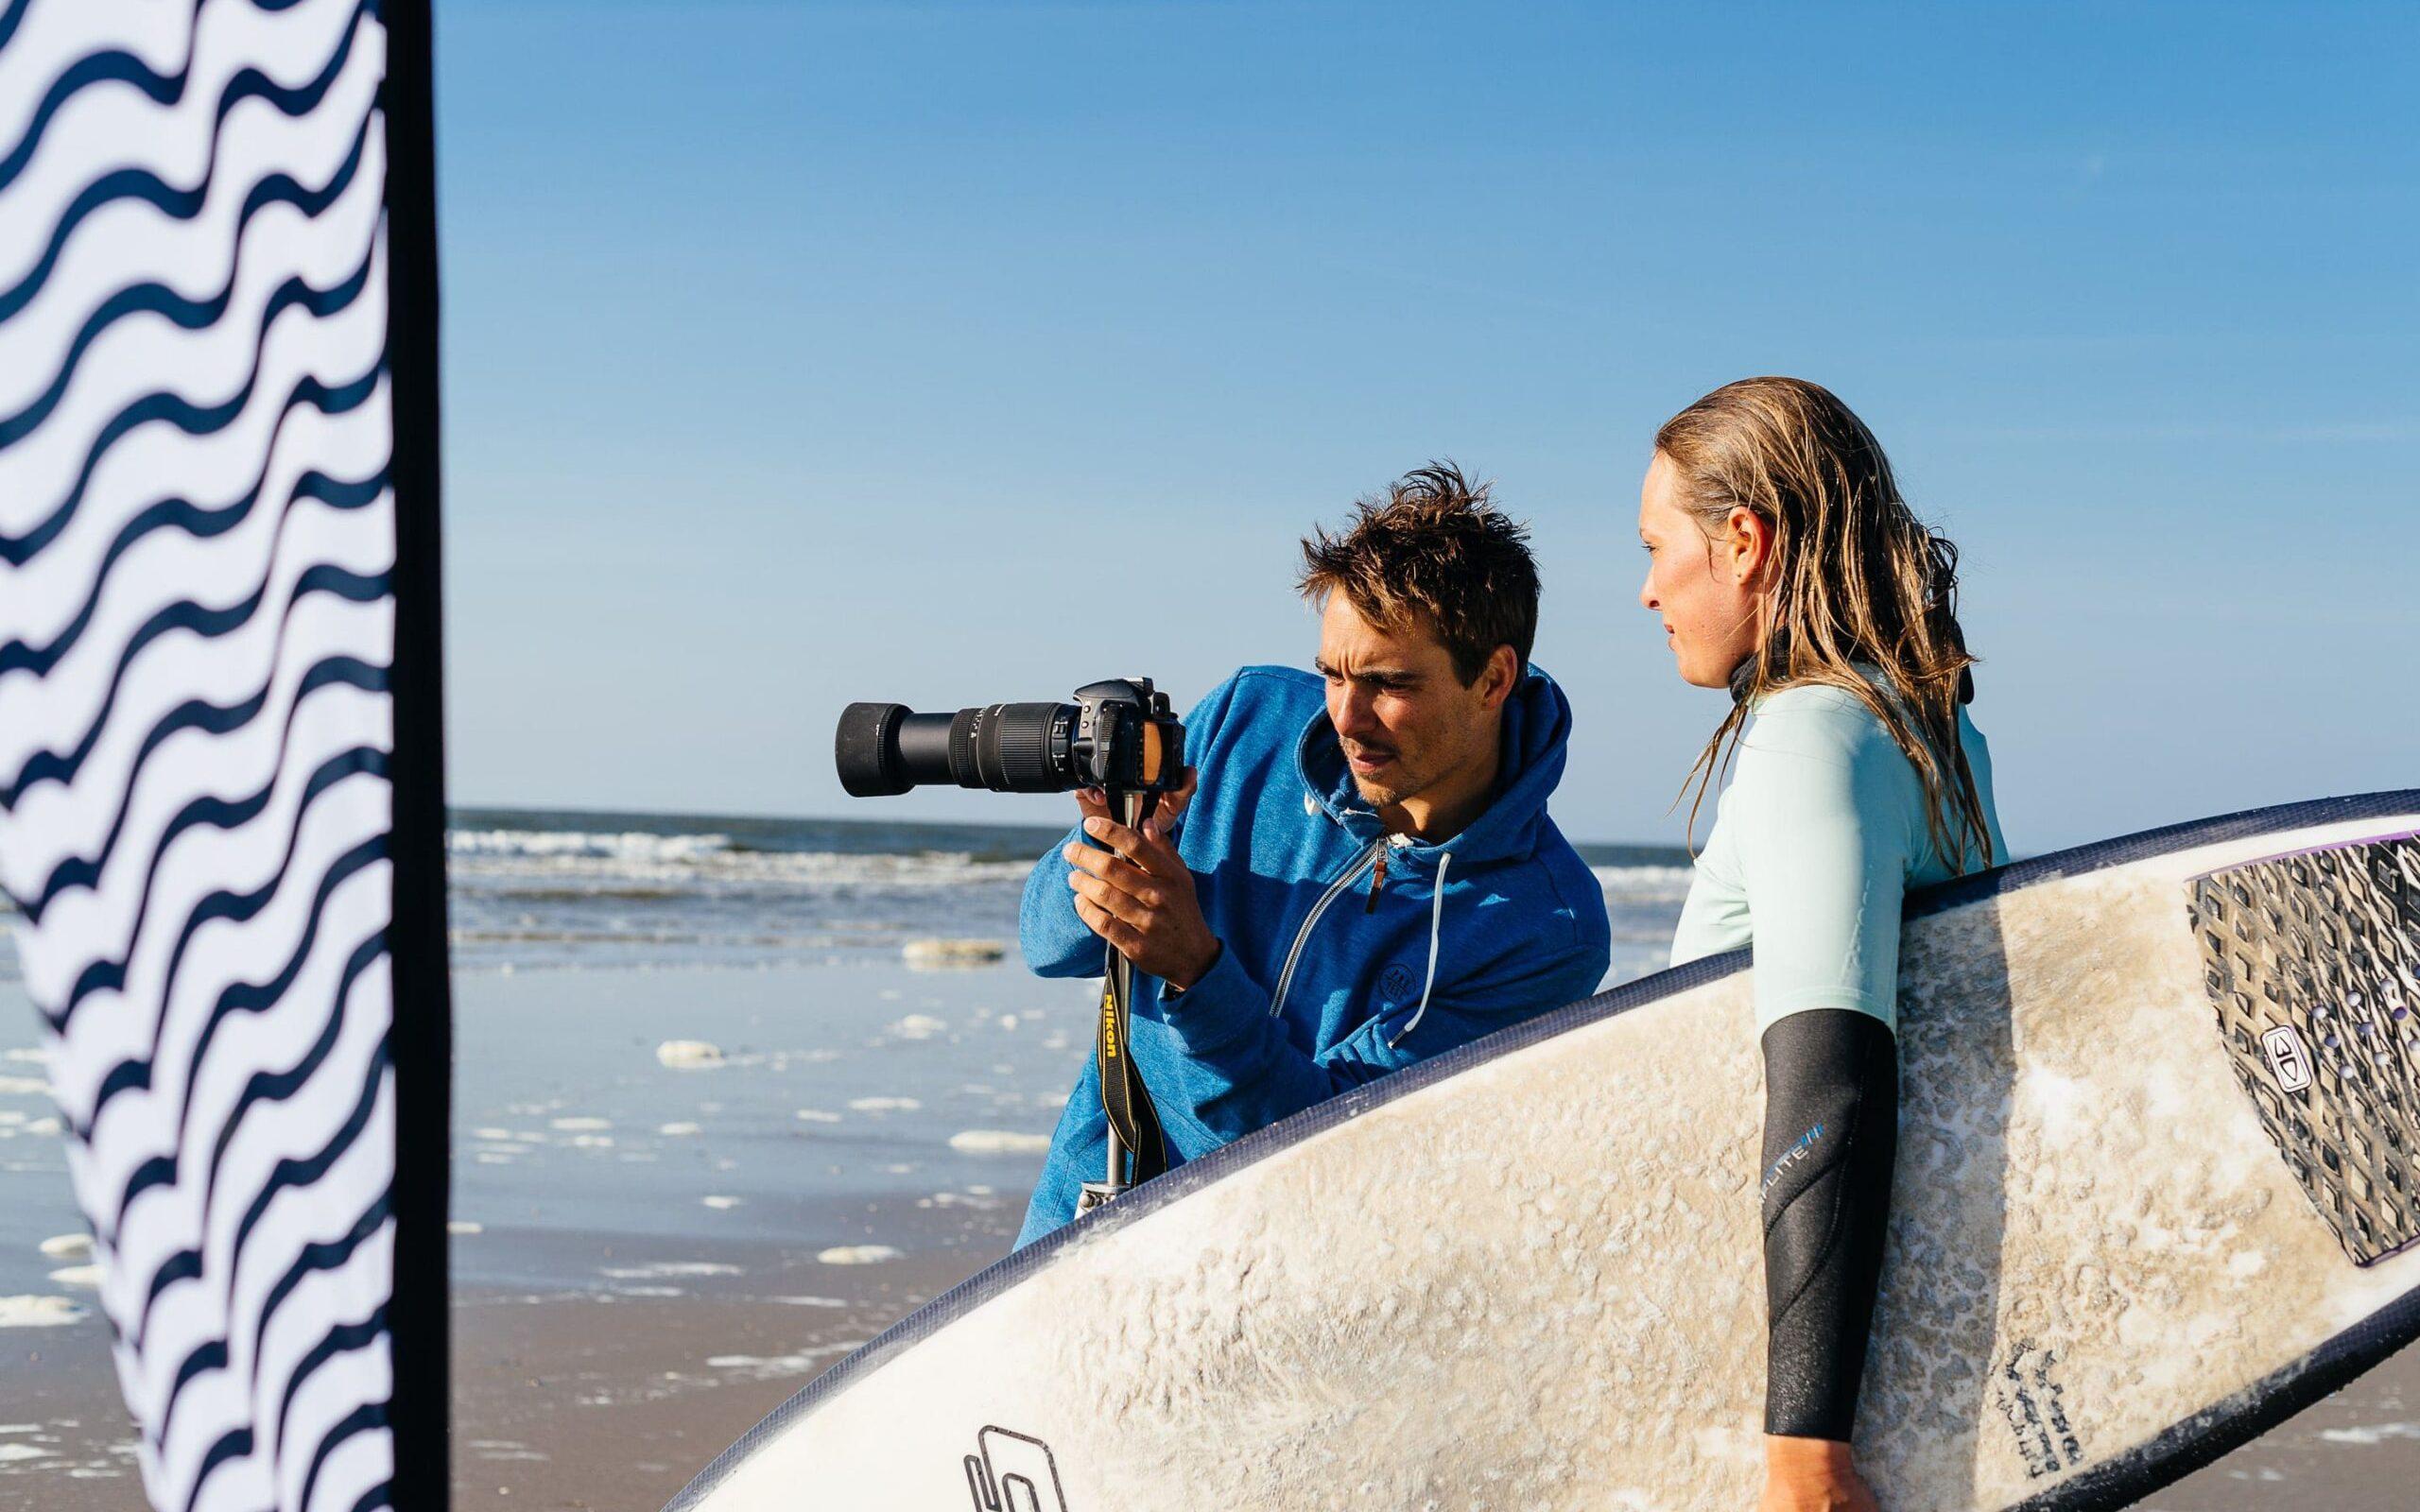 surfcoach geeft surftips met videoanalyse